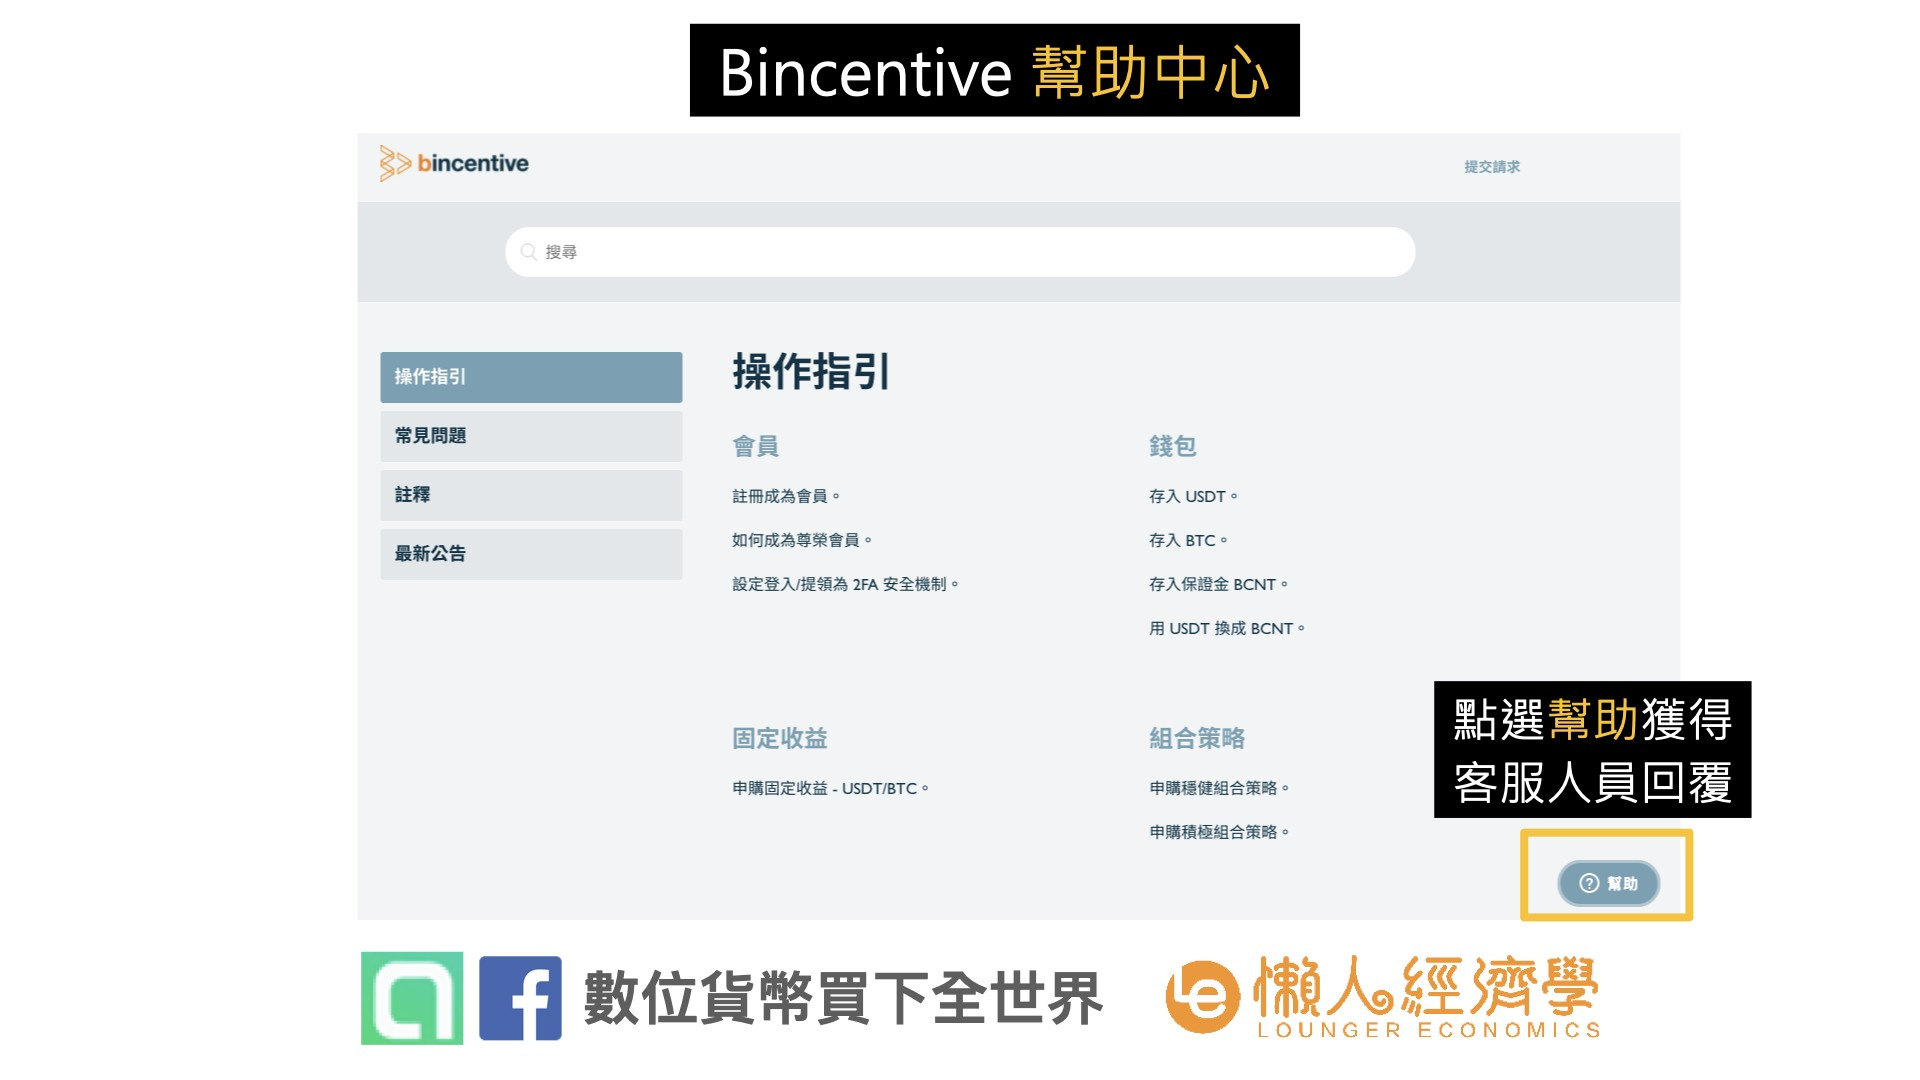 Bincentive 客服:bincentive 客服介面